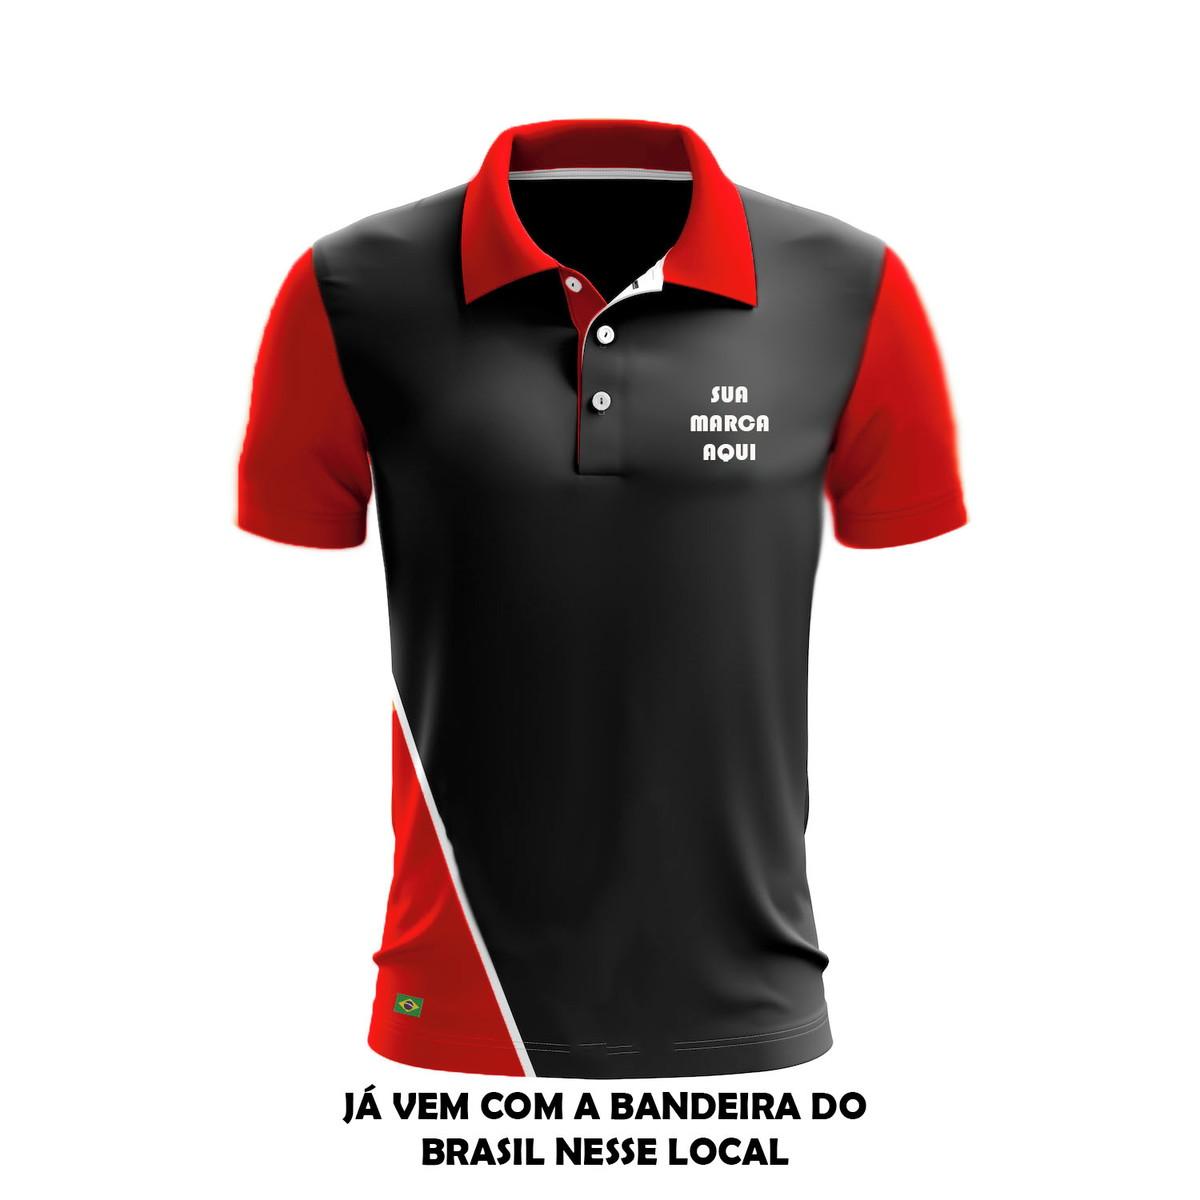 Camisa Camiseta pólo personalizada uniformes kit c  4 pçs no Elo7 ... 6d538835684da